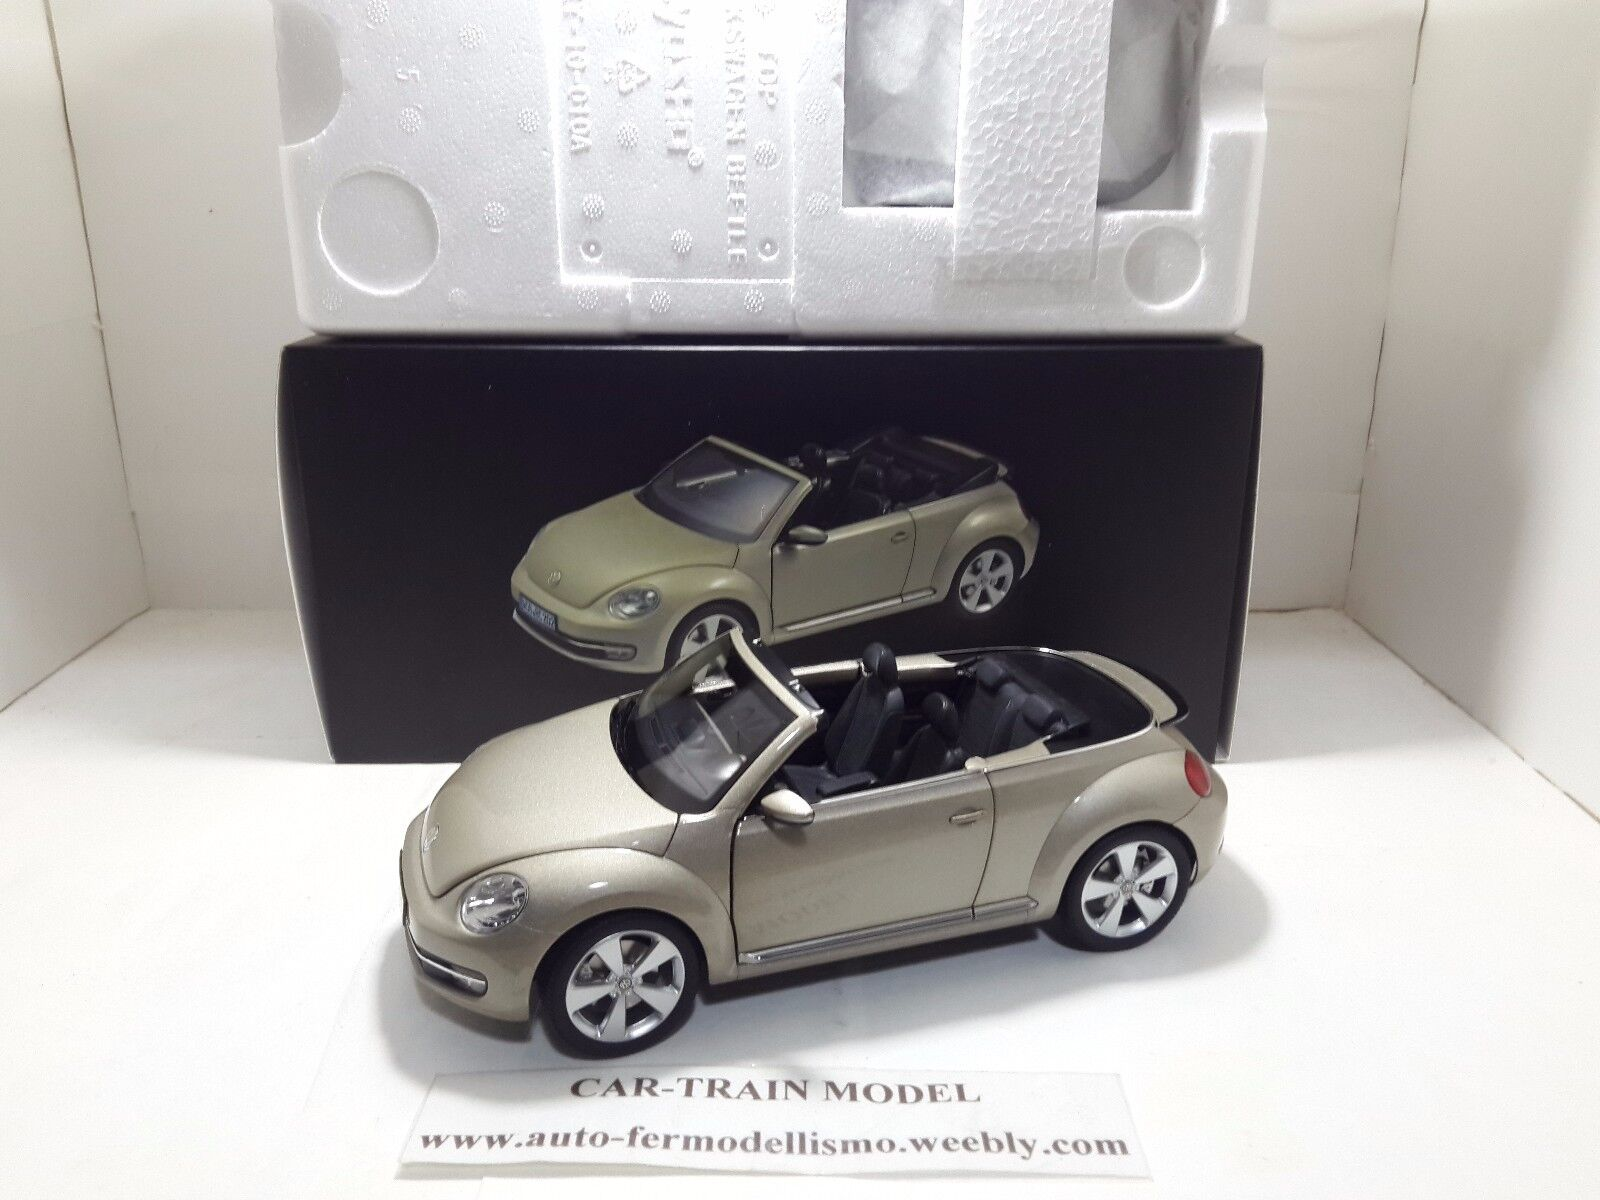 Porta Oggetti Volkswagen.Volkswagen Beetle Cabriolet 1 18 18 1 18 1 Kyosho